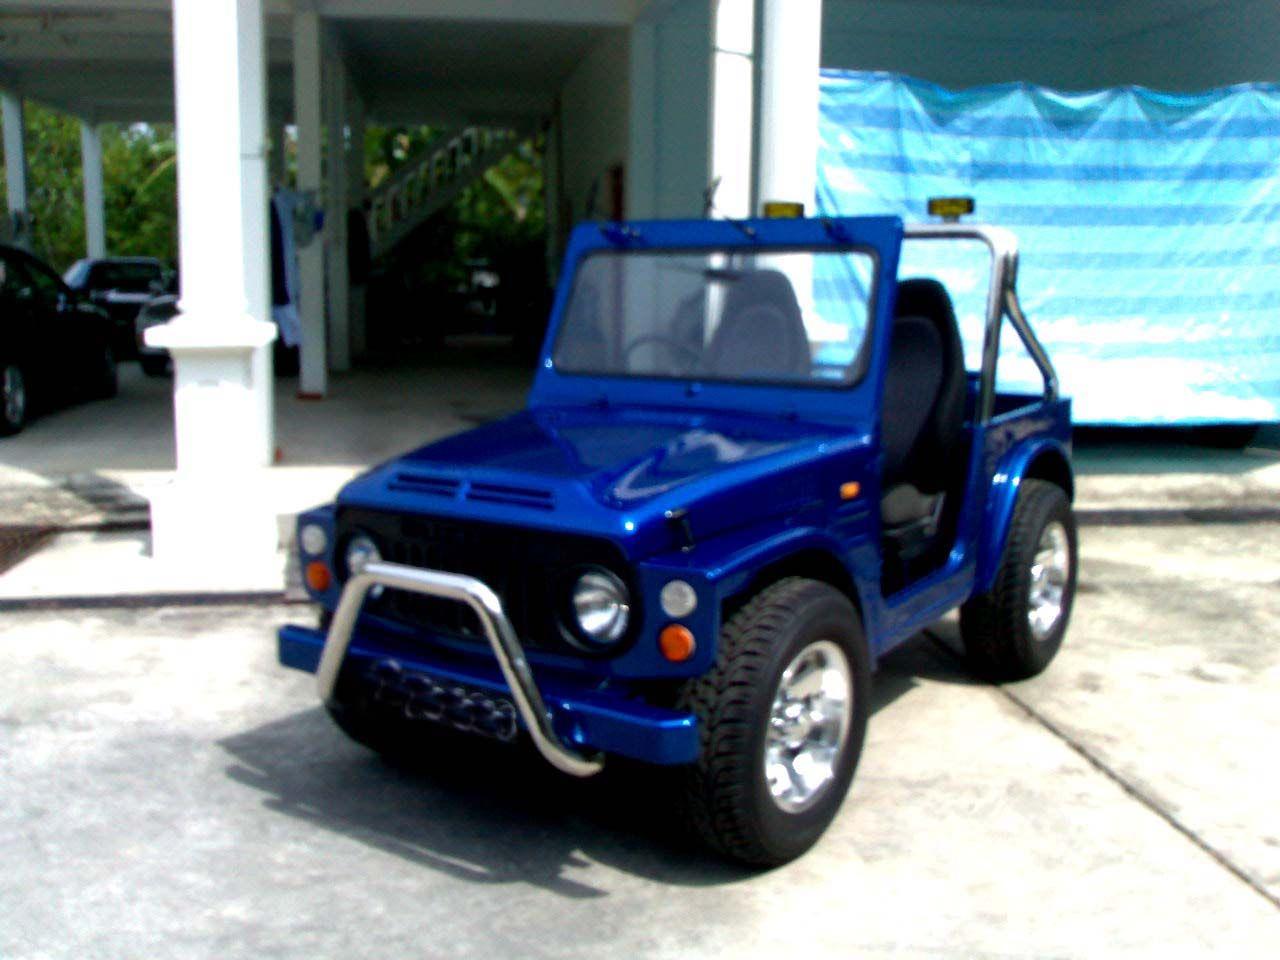 8400 Gambar Modifikasi Mobil Suzuki Carry Futura Gratis Terbaru